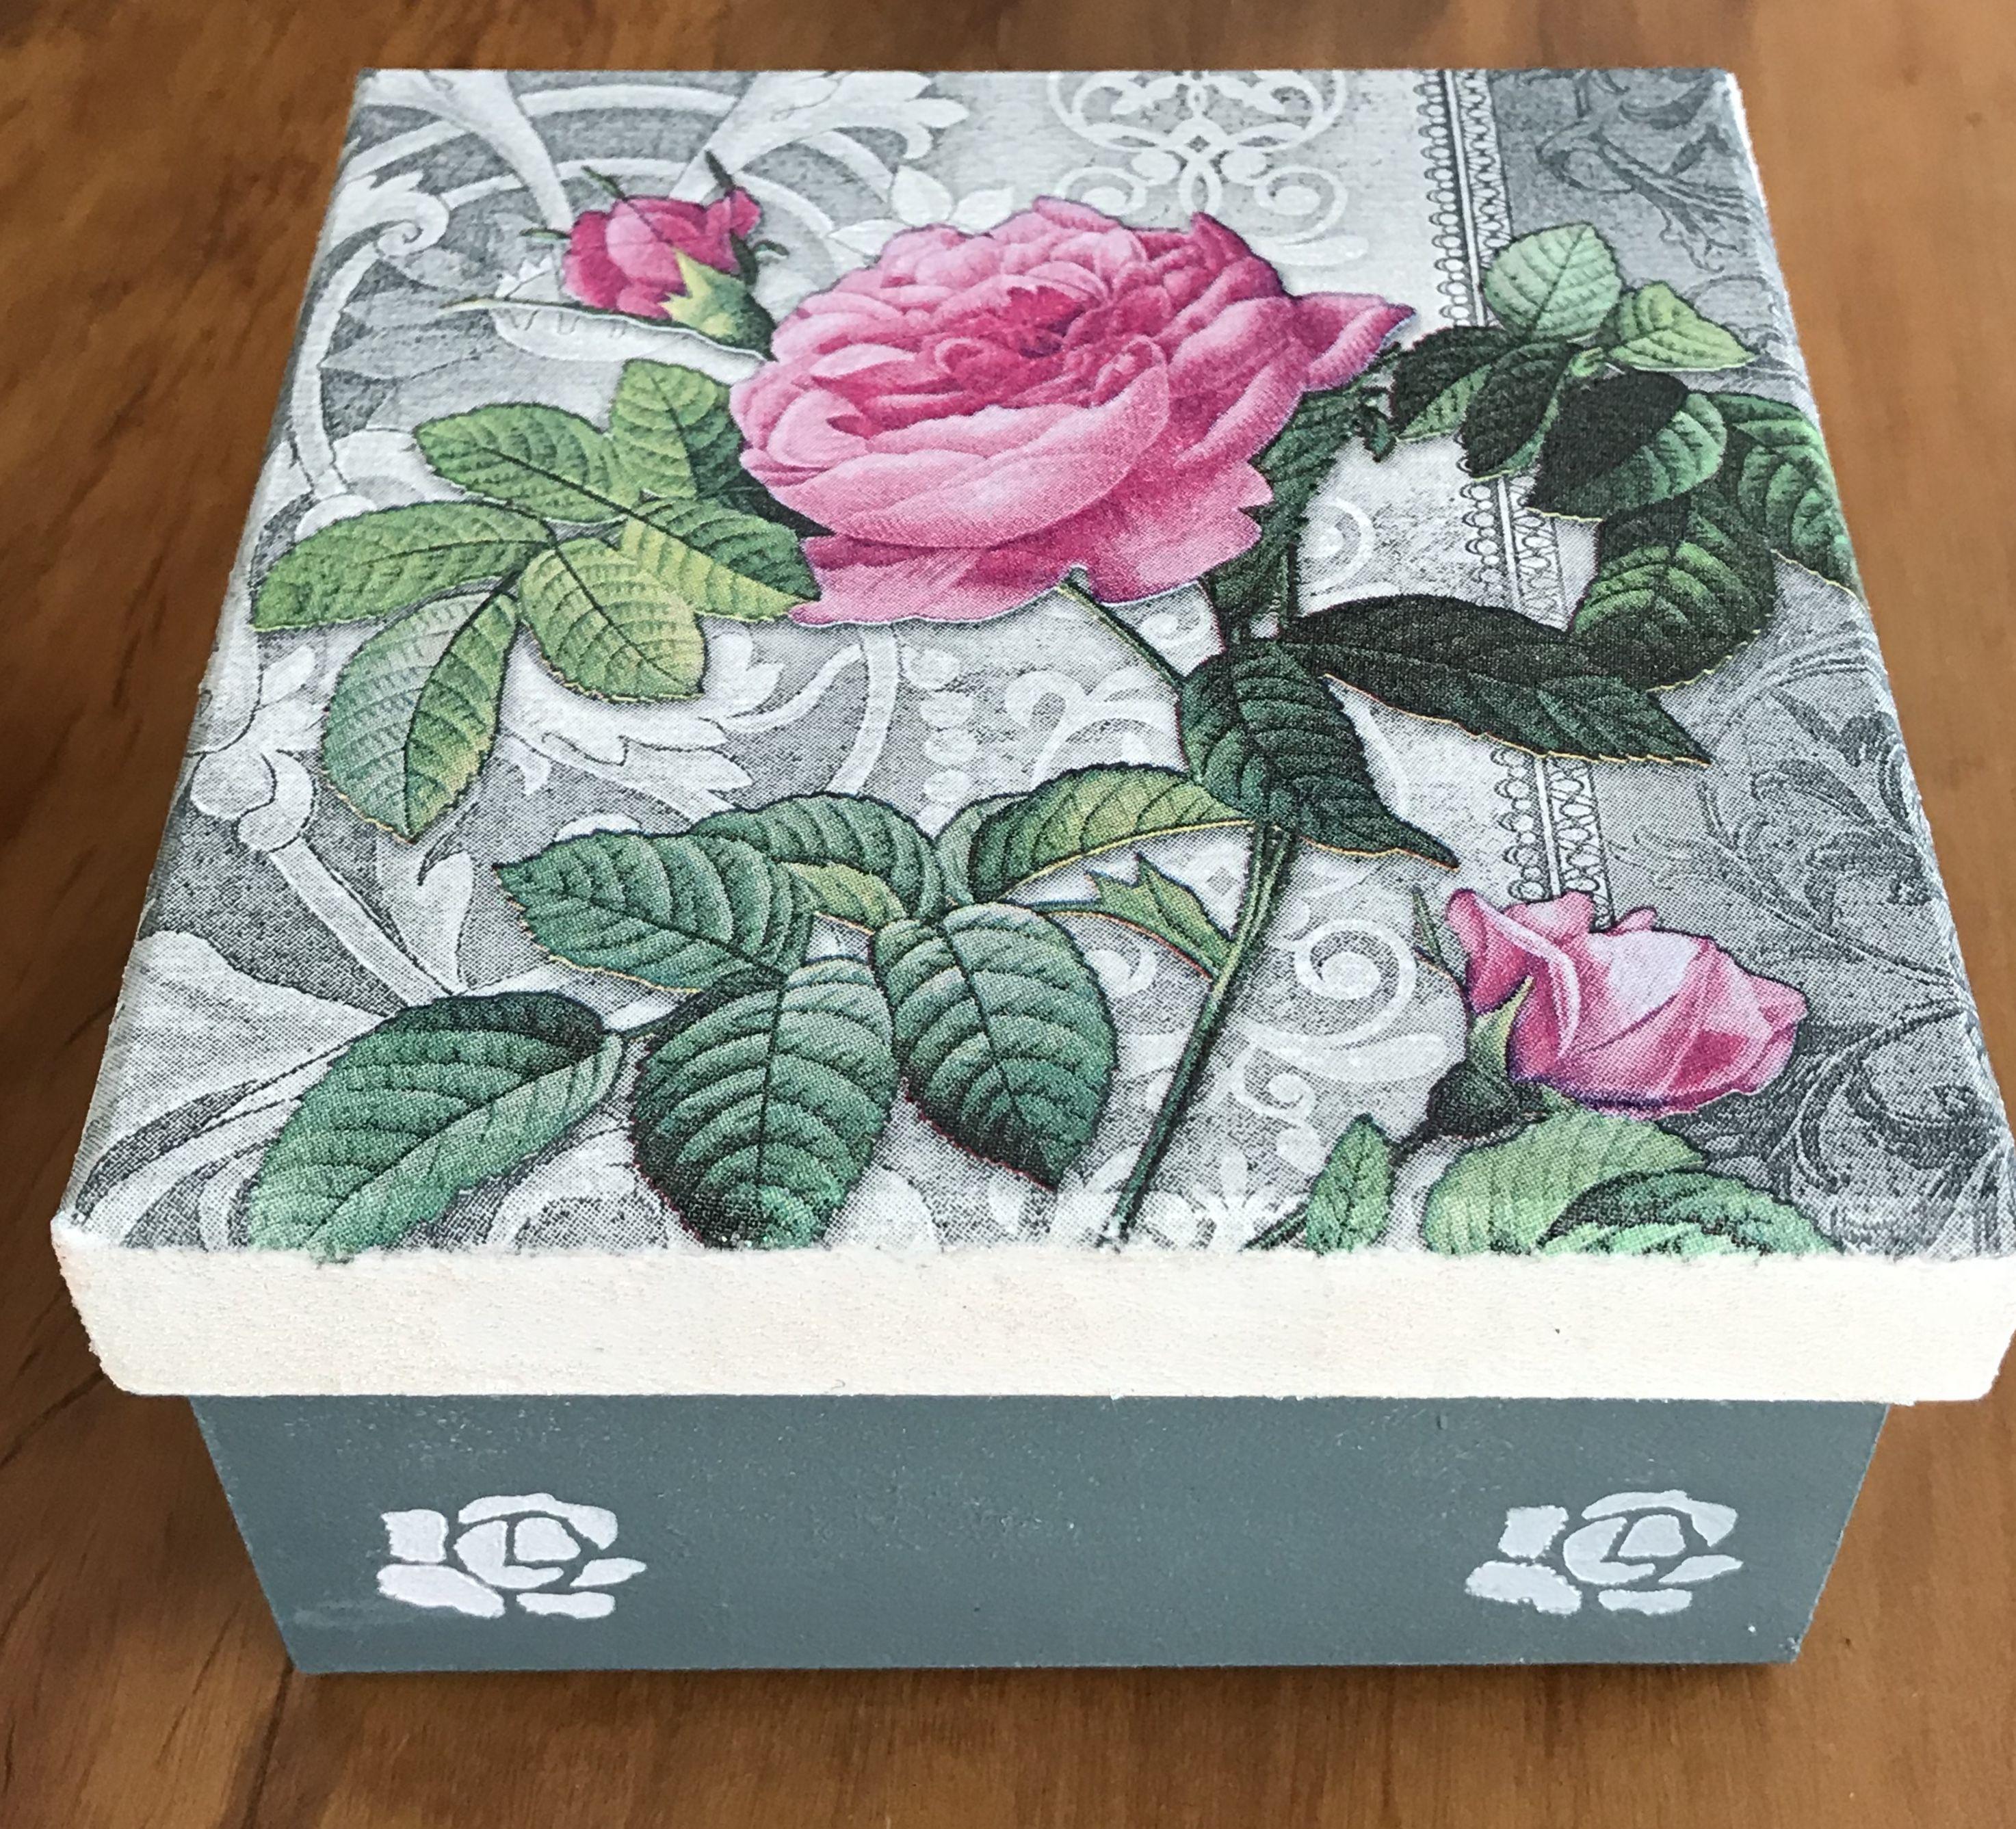 Handmade Decorative Boxes Pinyolandaos On Cajas  Pinterest  Decoupage And Craft